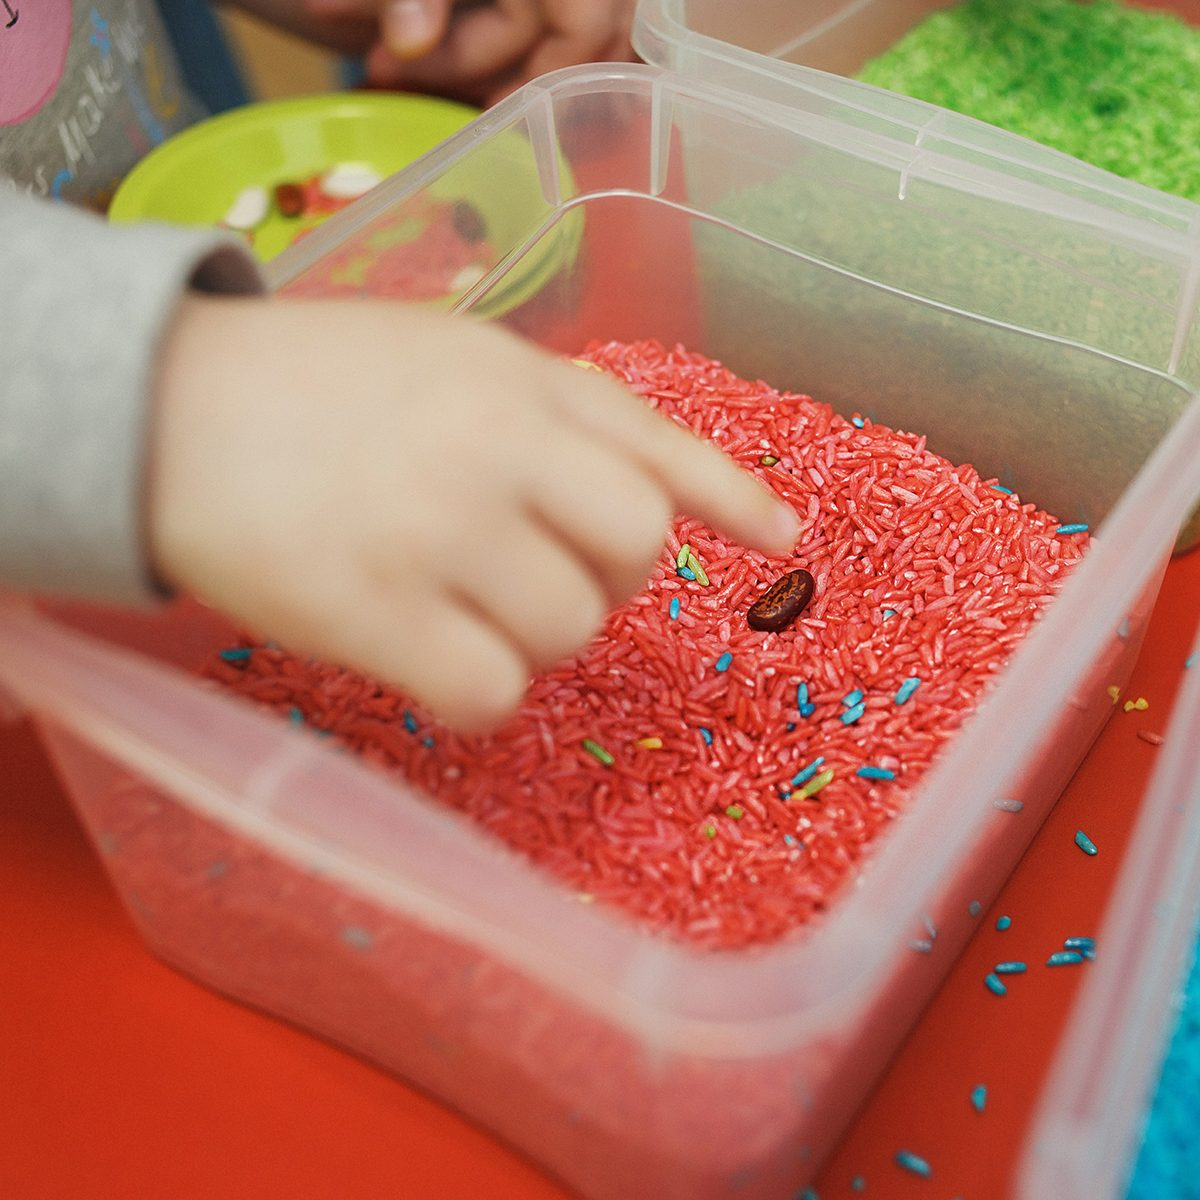 Children play educational games with a sensory bin in kindergarten.